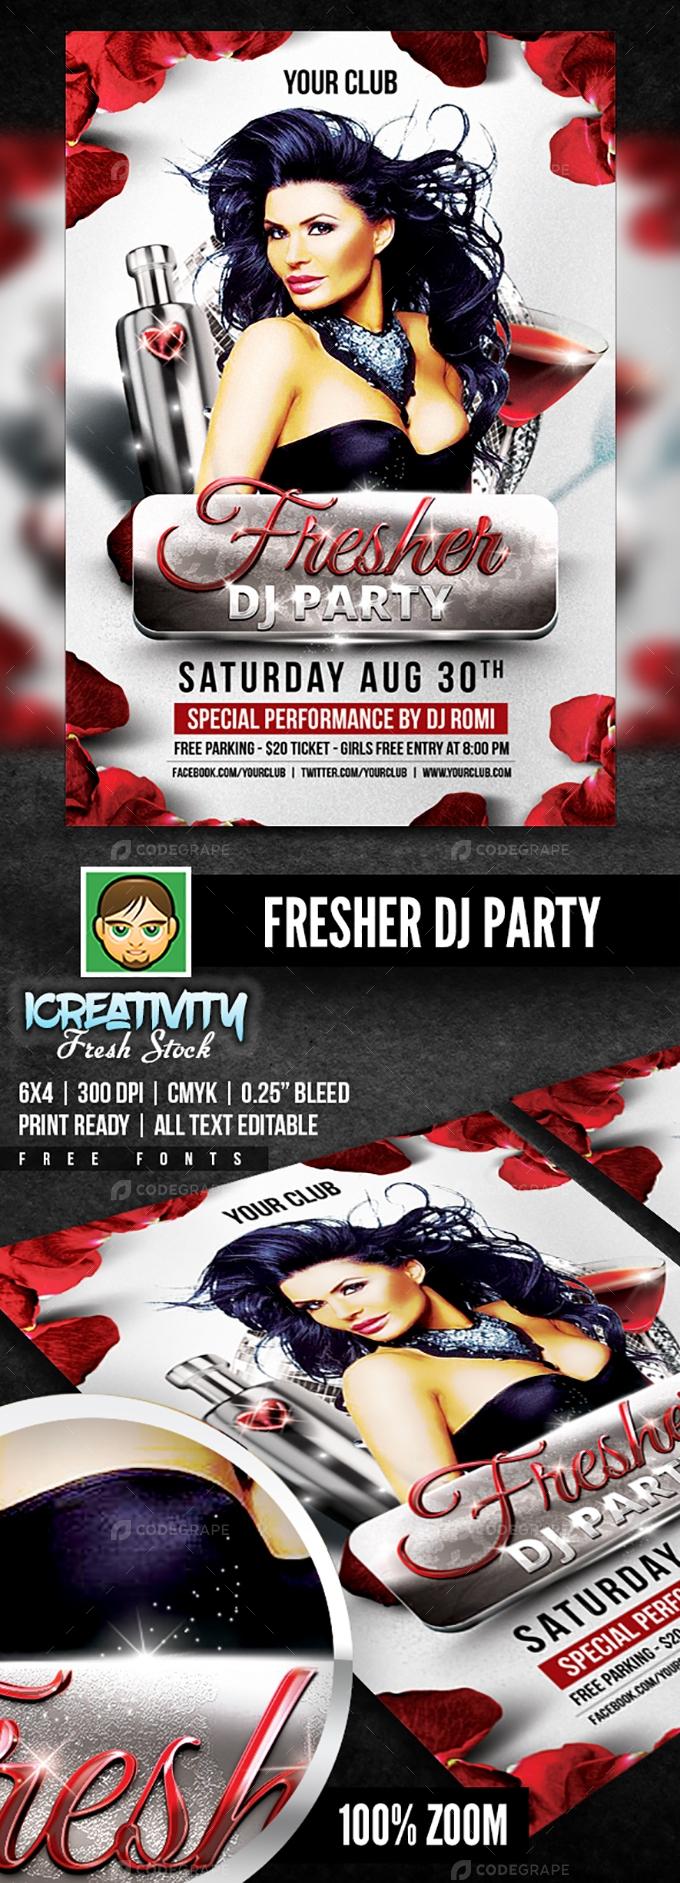 Fresher Dj Party Flyer